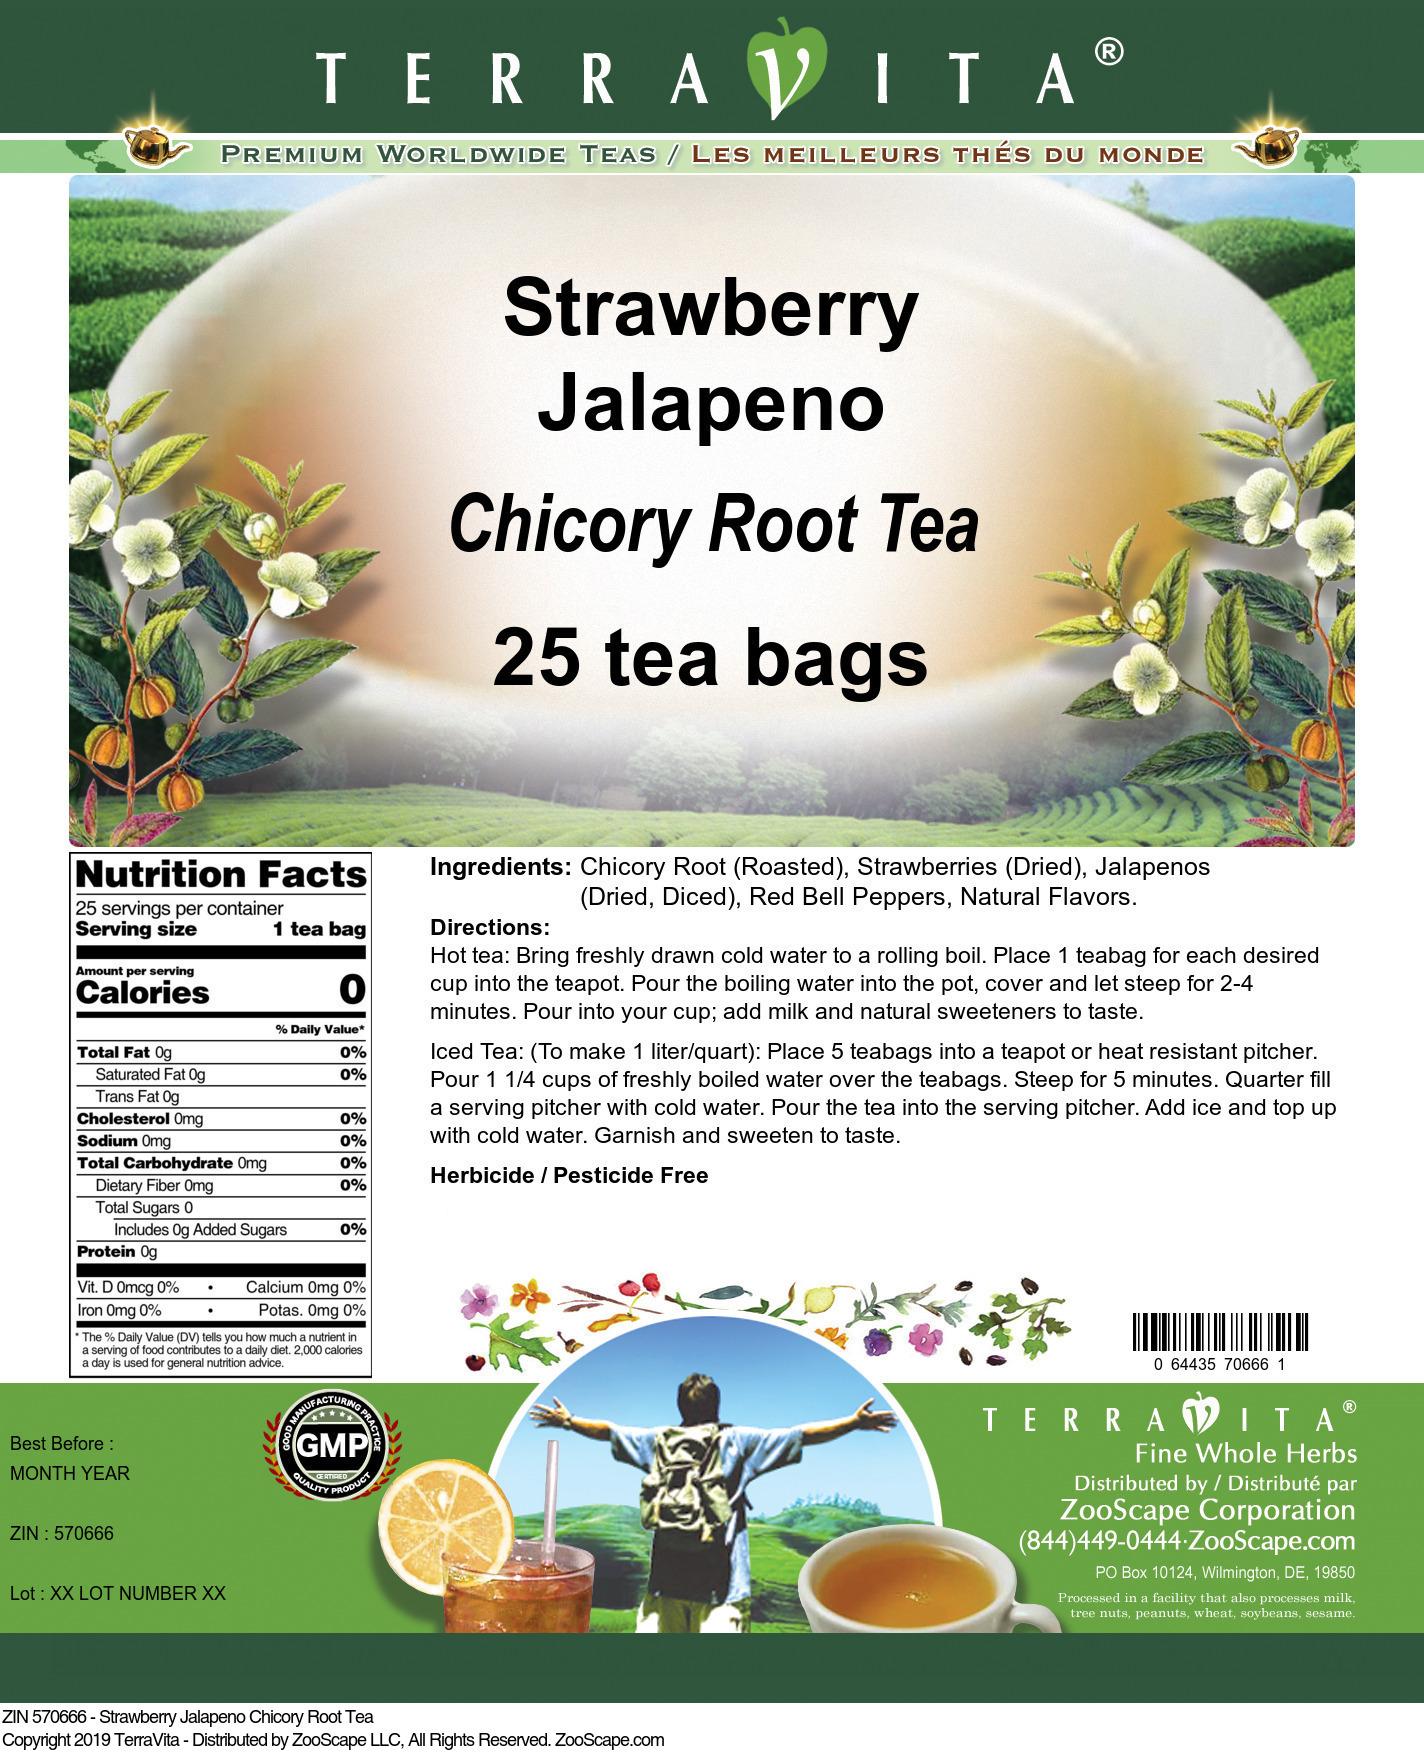 Strawberry Jalapeno Chicory Root